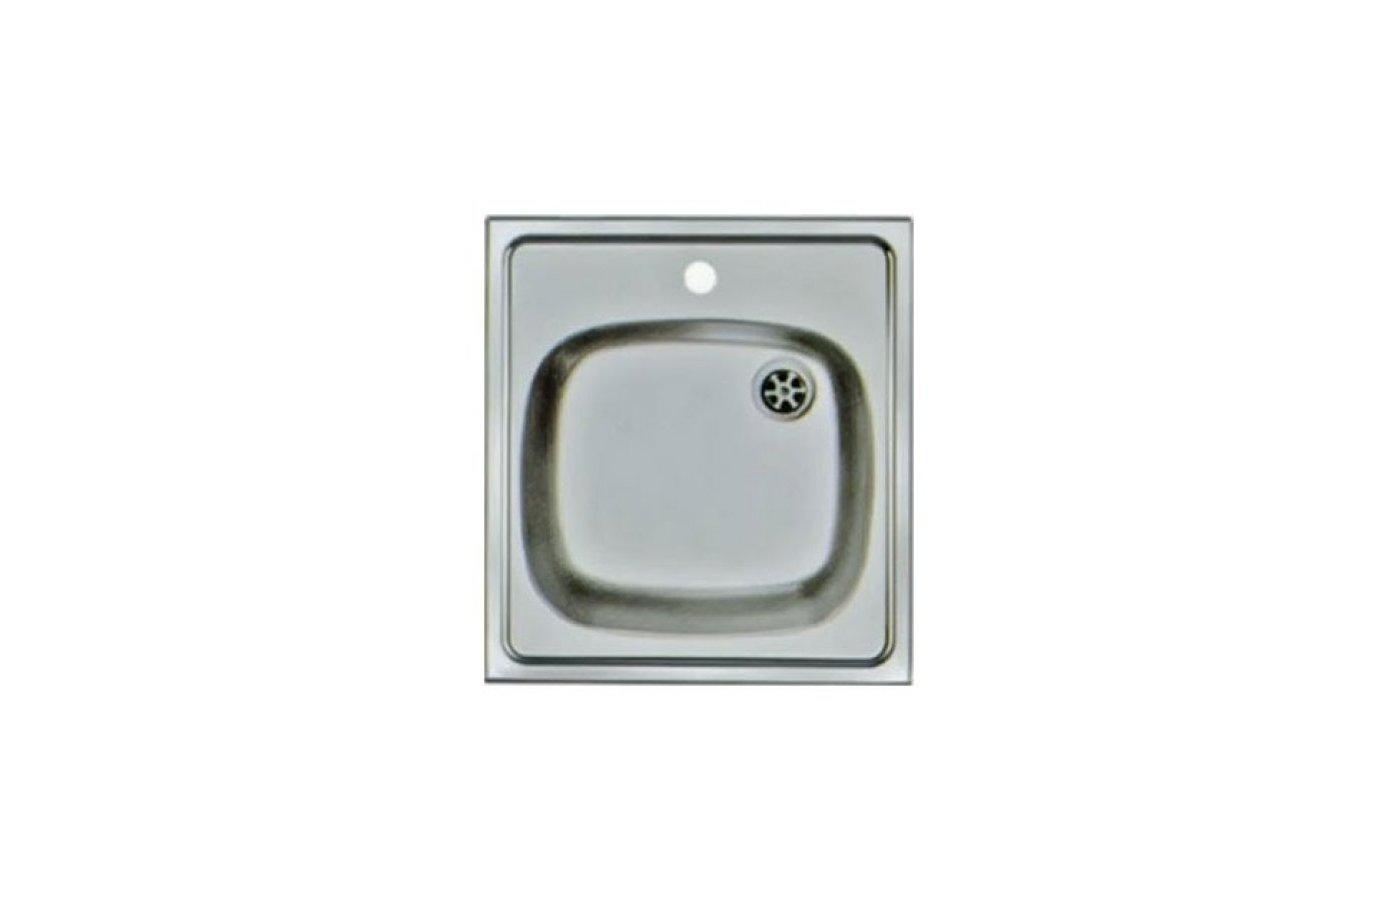 Кухонная мойка FRANKE ETX 610-45 Вентиль 1.5 + комплект для монтажа